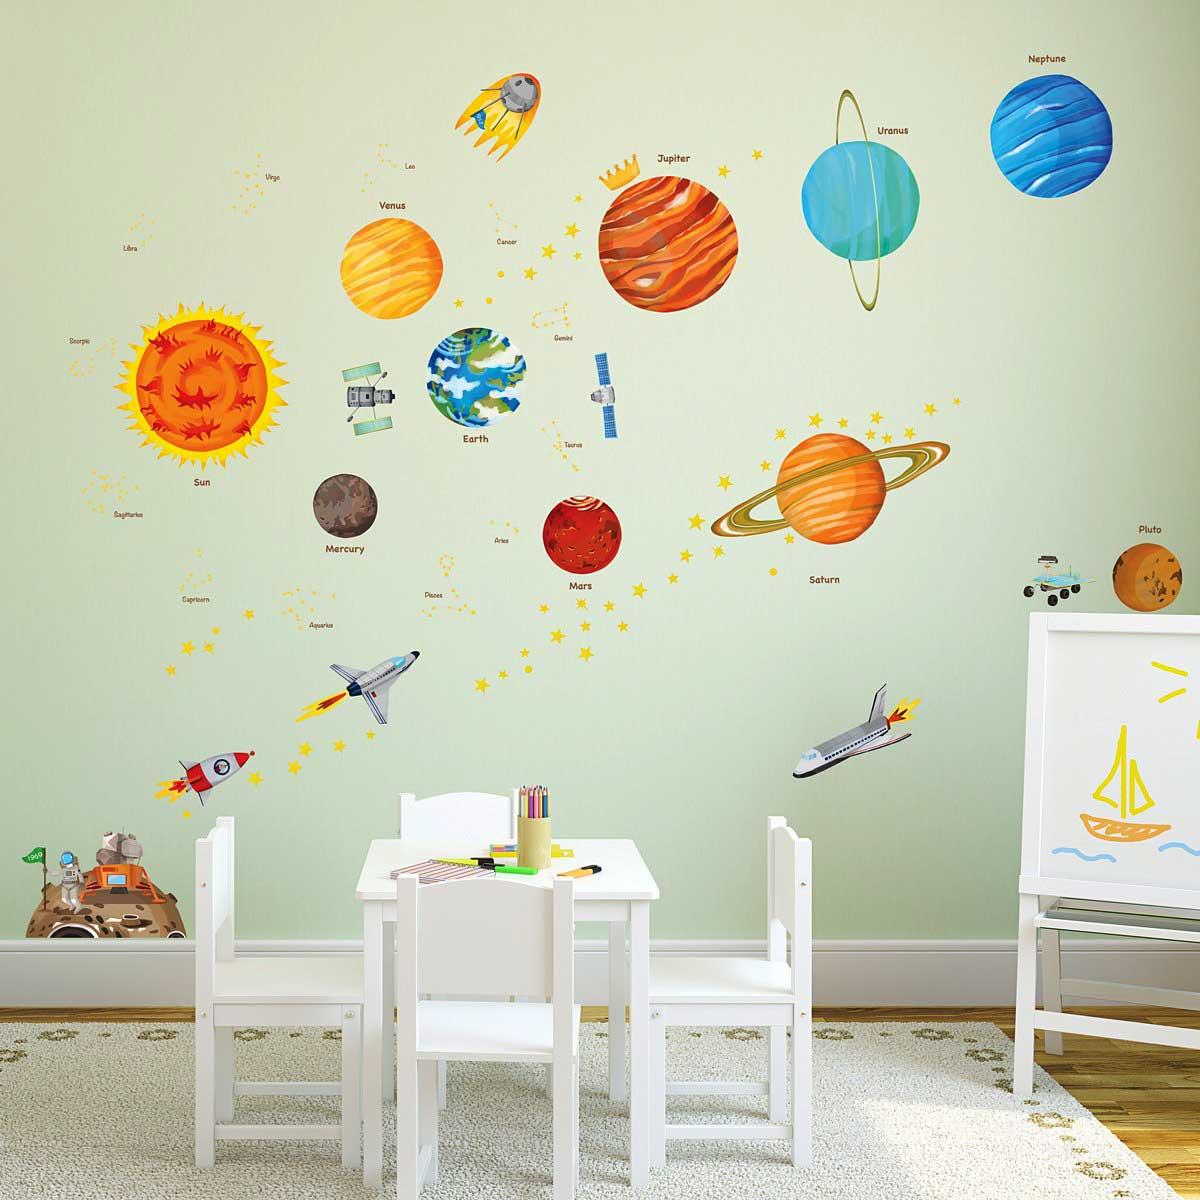 wandsticker planeten sonnensystem weltraum wandsticker. Black Bedroom Furniture Sets. Home Design Ideas